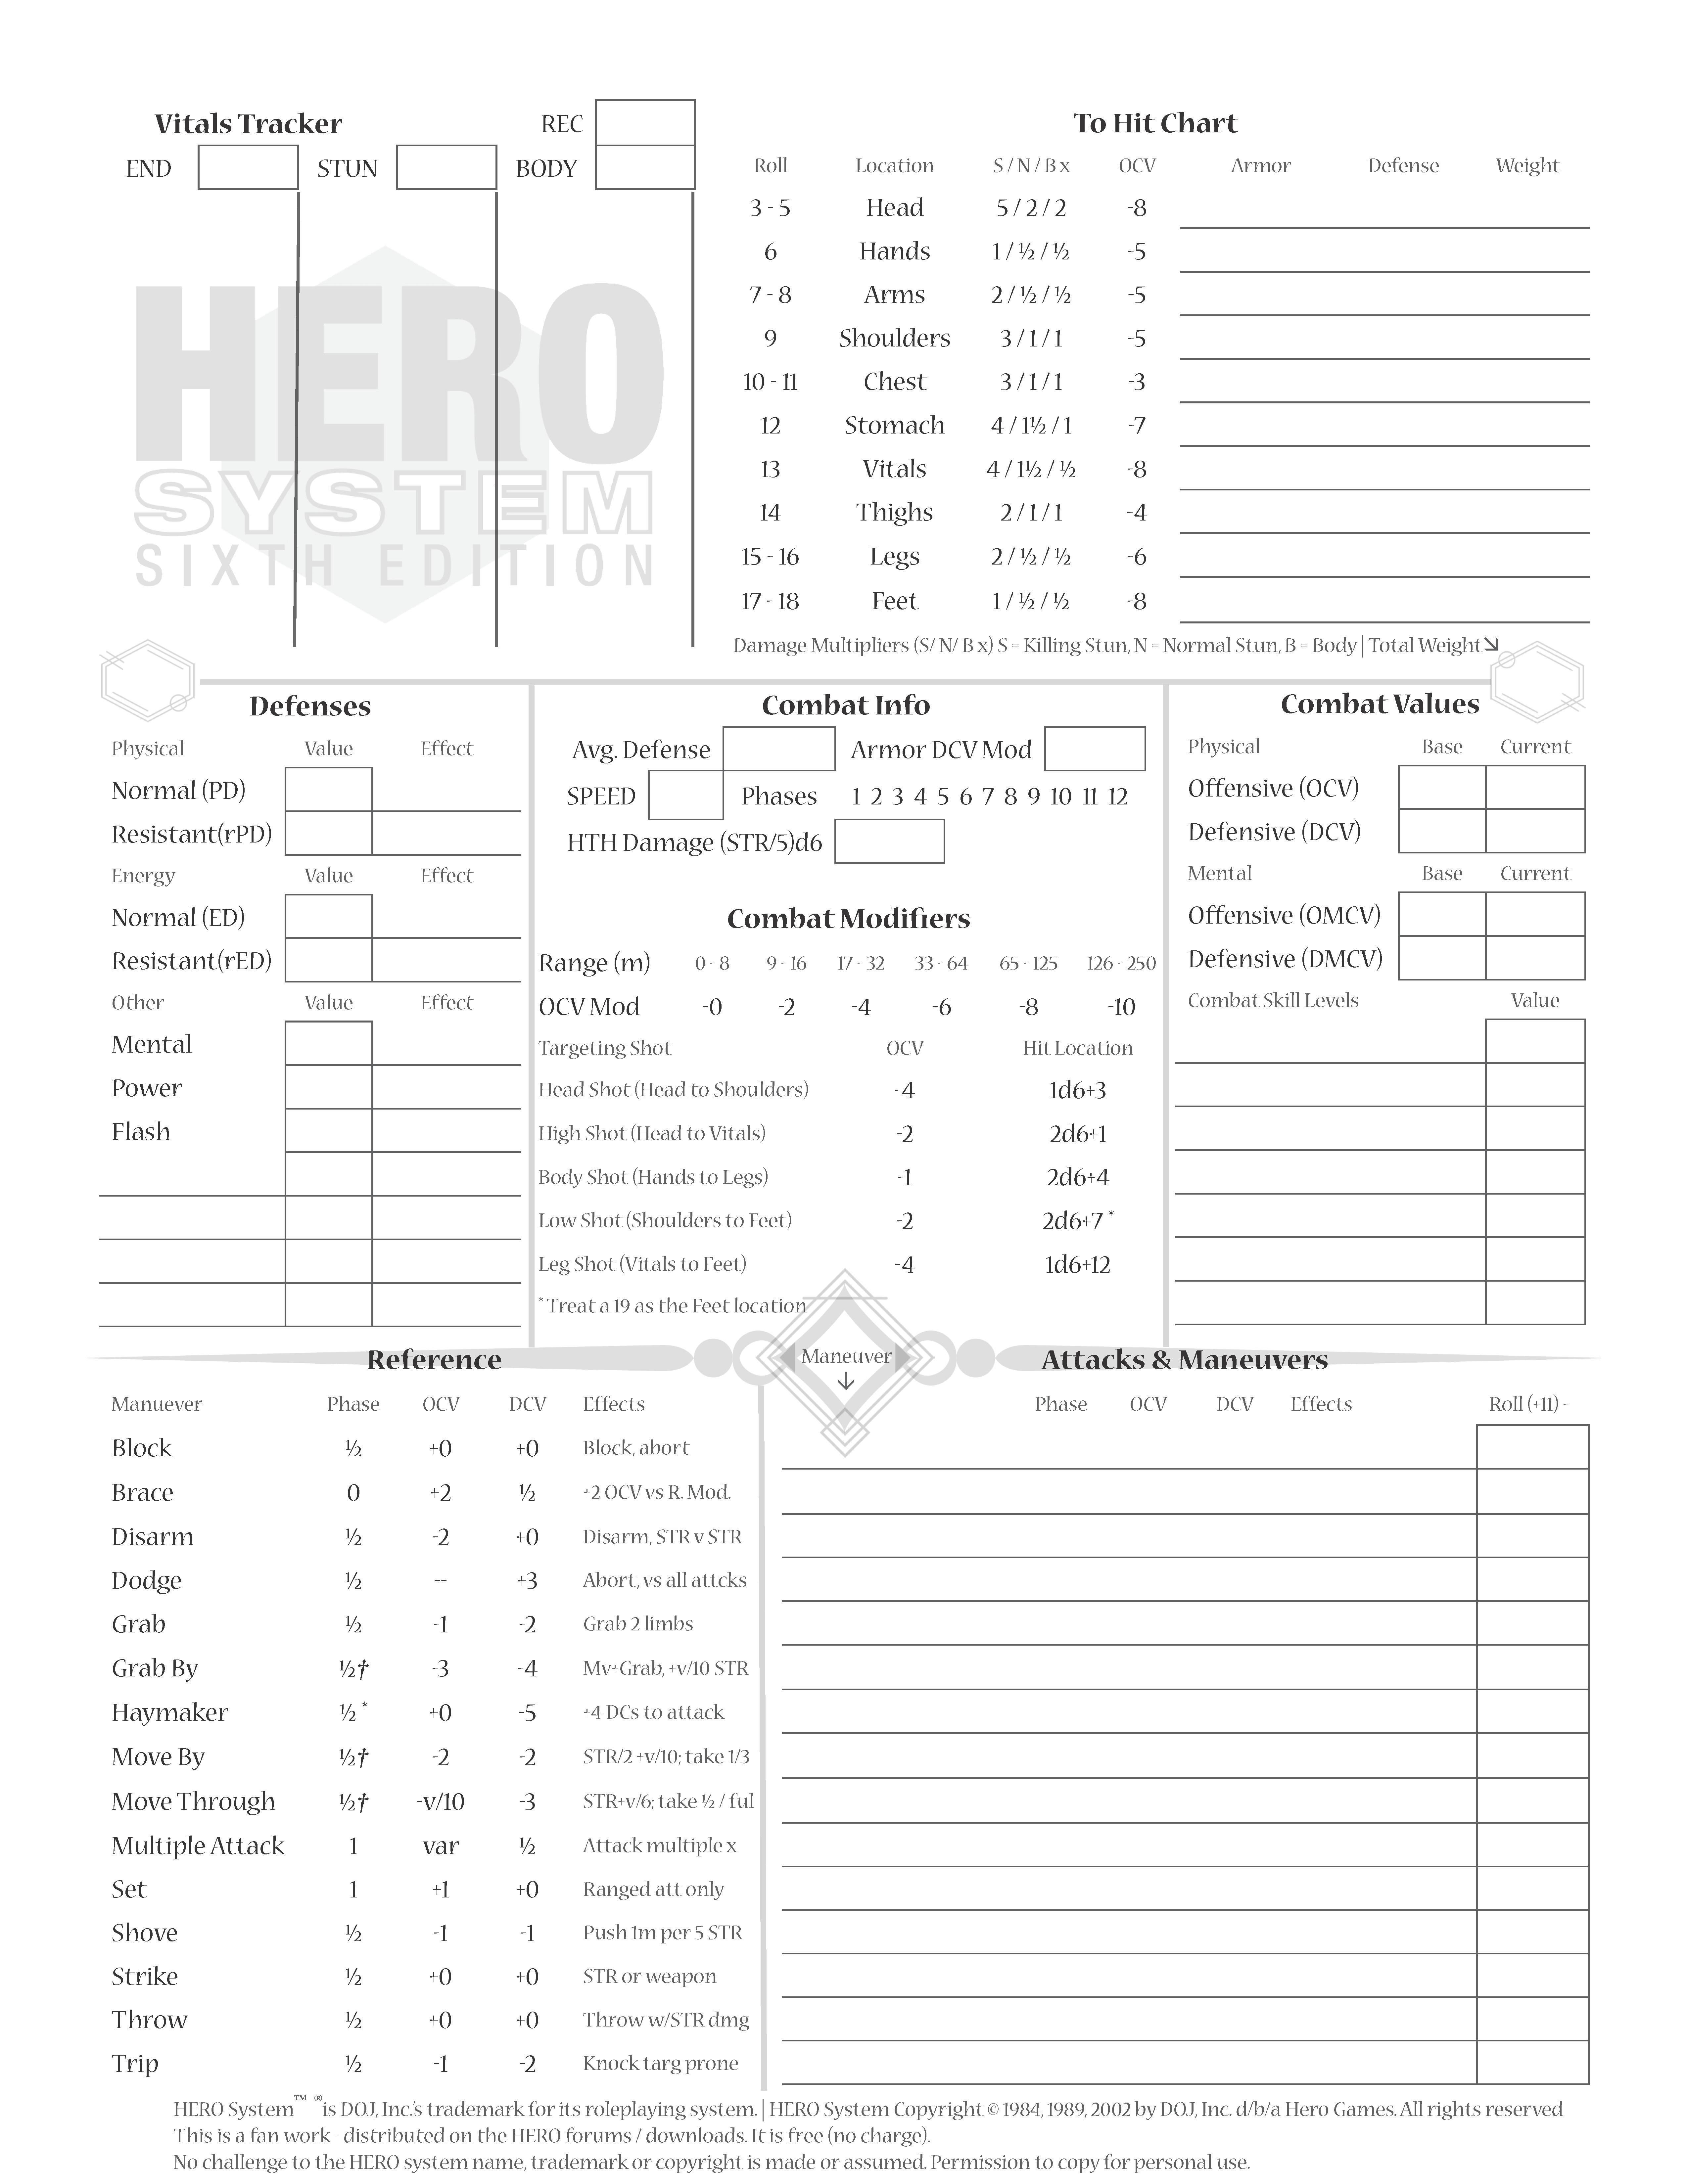 HERO6e_CharSheetDeluxe_TreChriron - HERO System 6th Edition